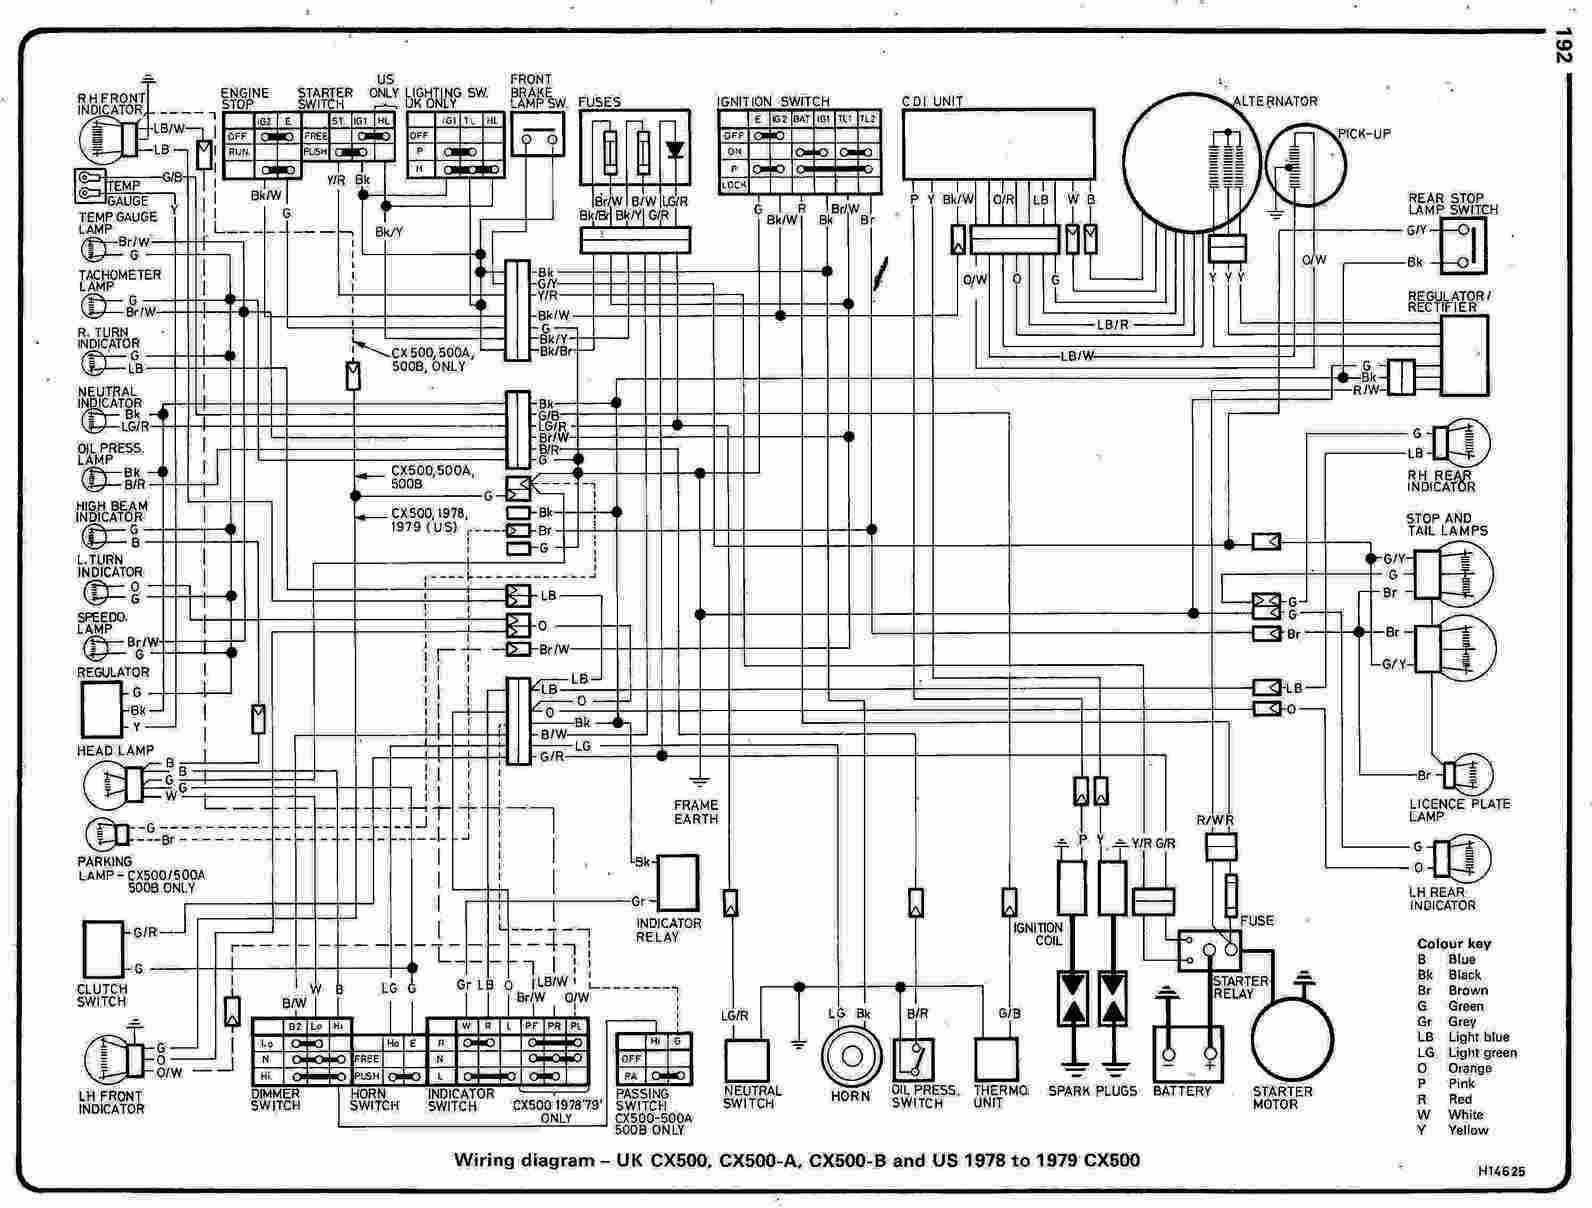 78 chevy truck wiring diagram triumph symbols c10 fuel schematic free engine image